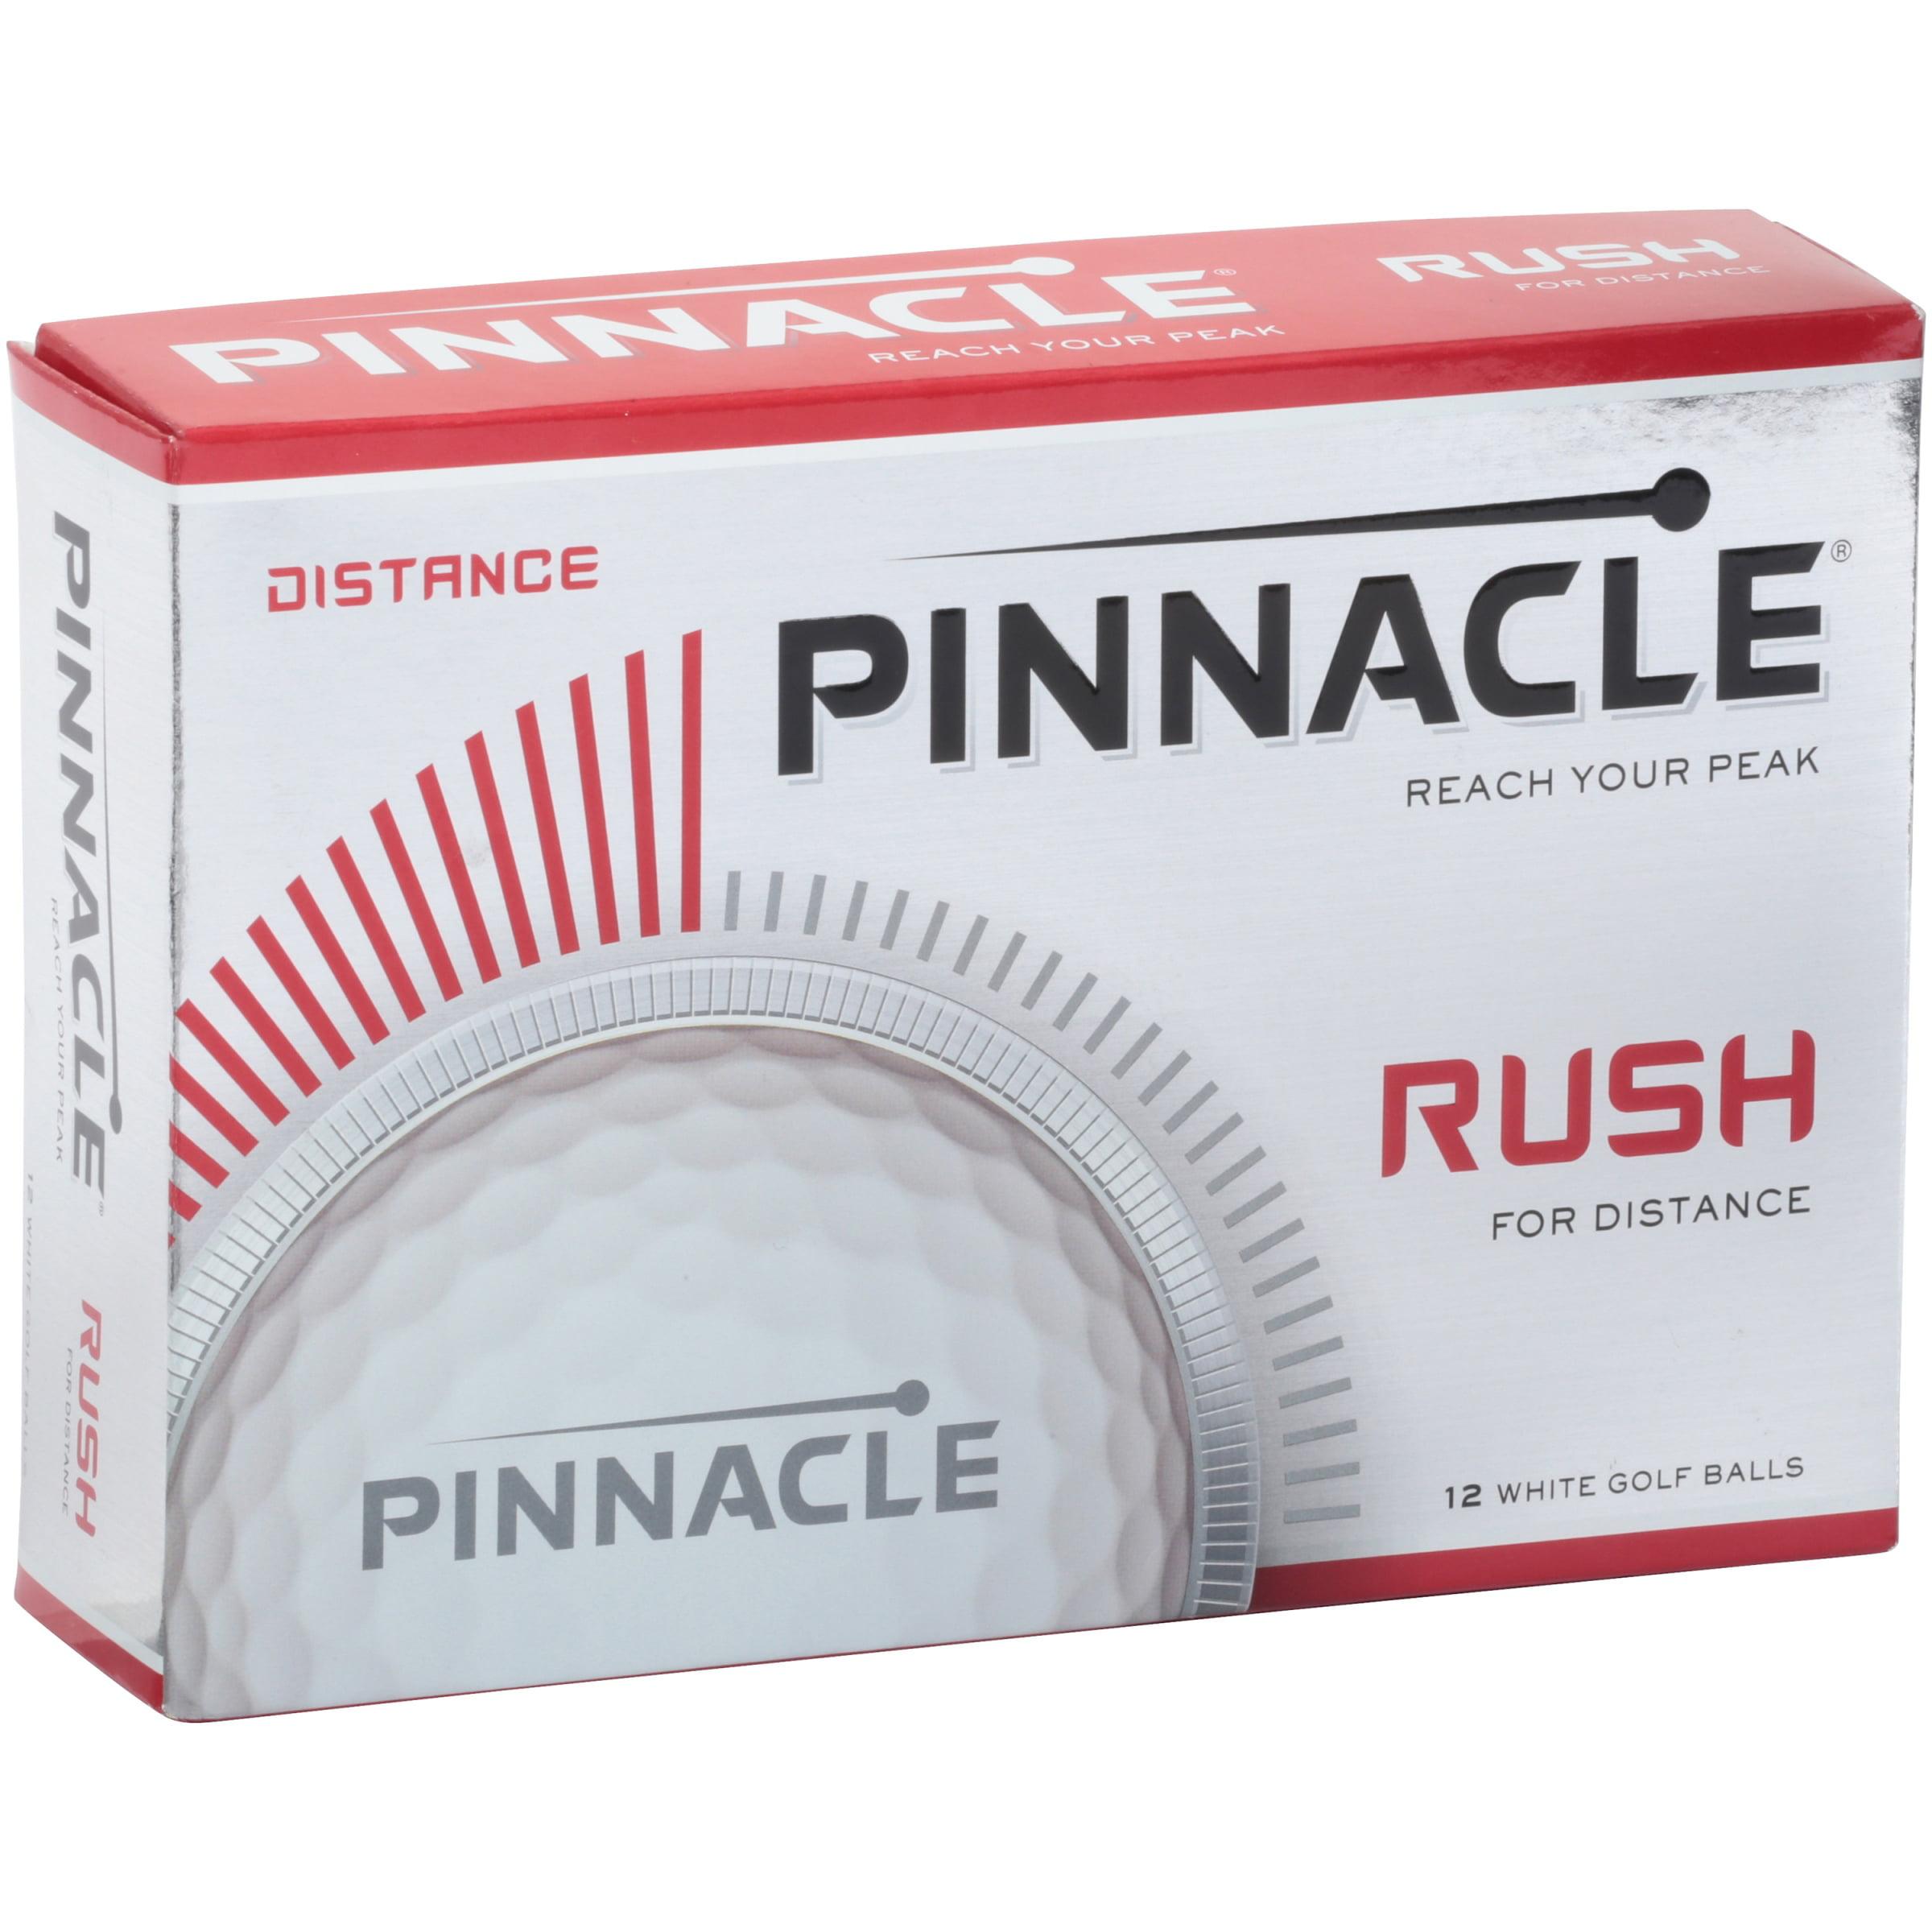 Pinnacle Rush for Distance Golf Balls, 12 Pack